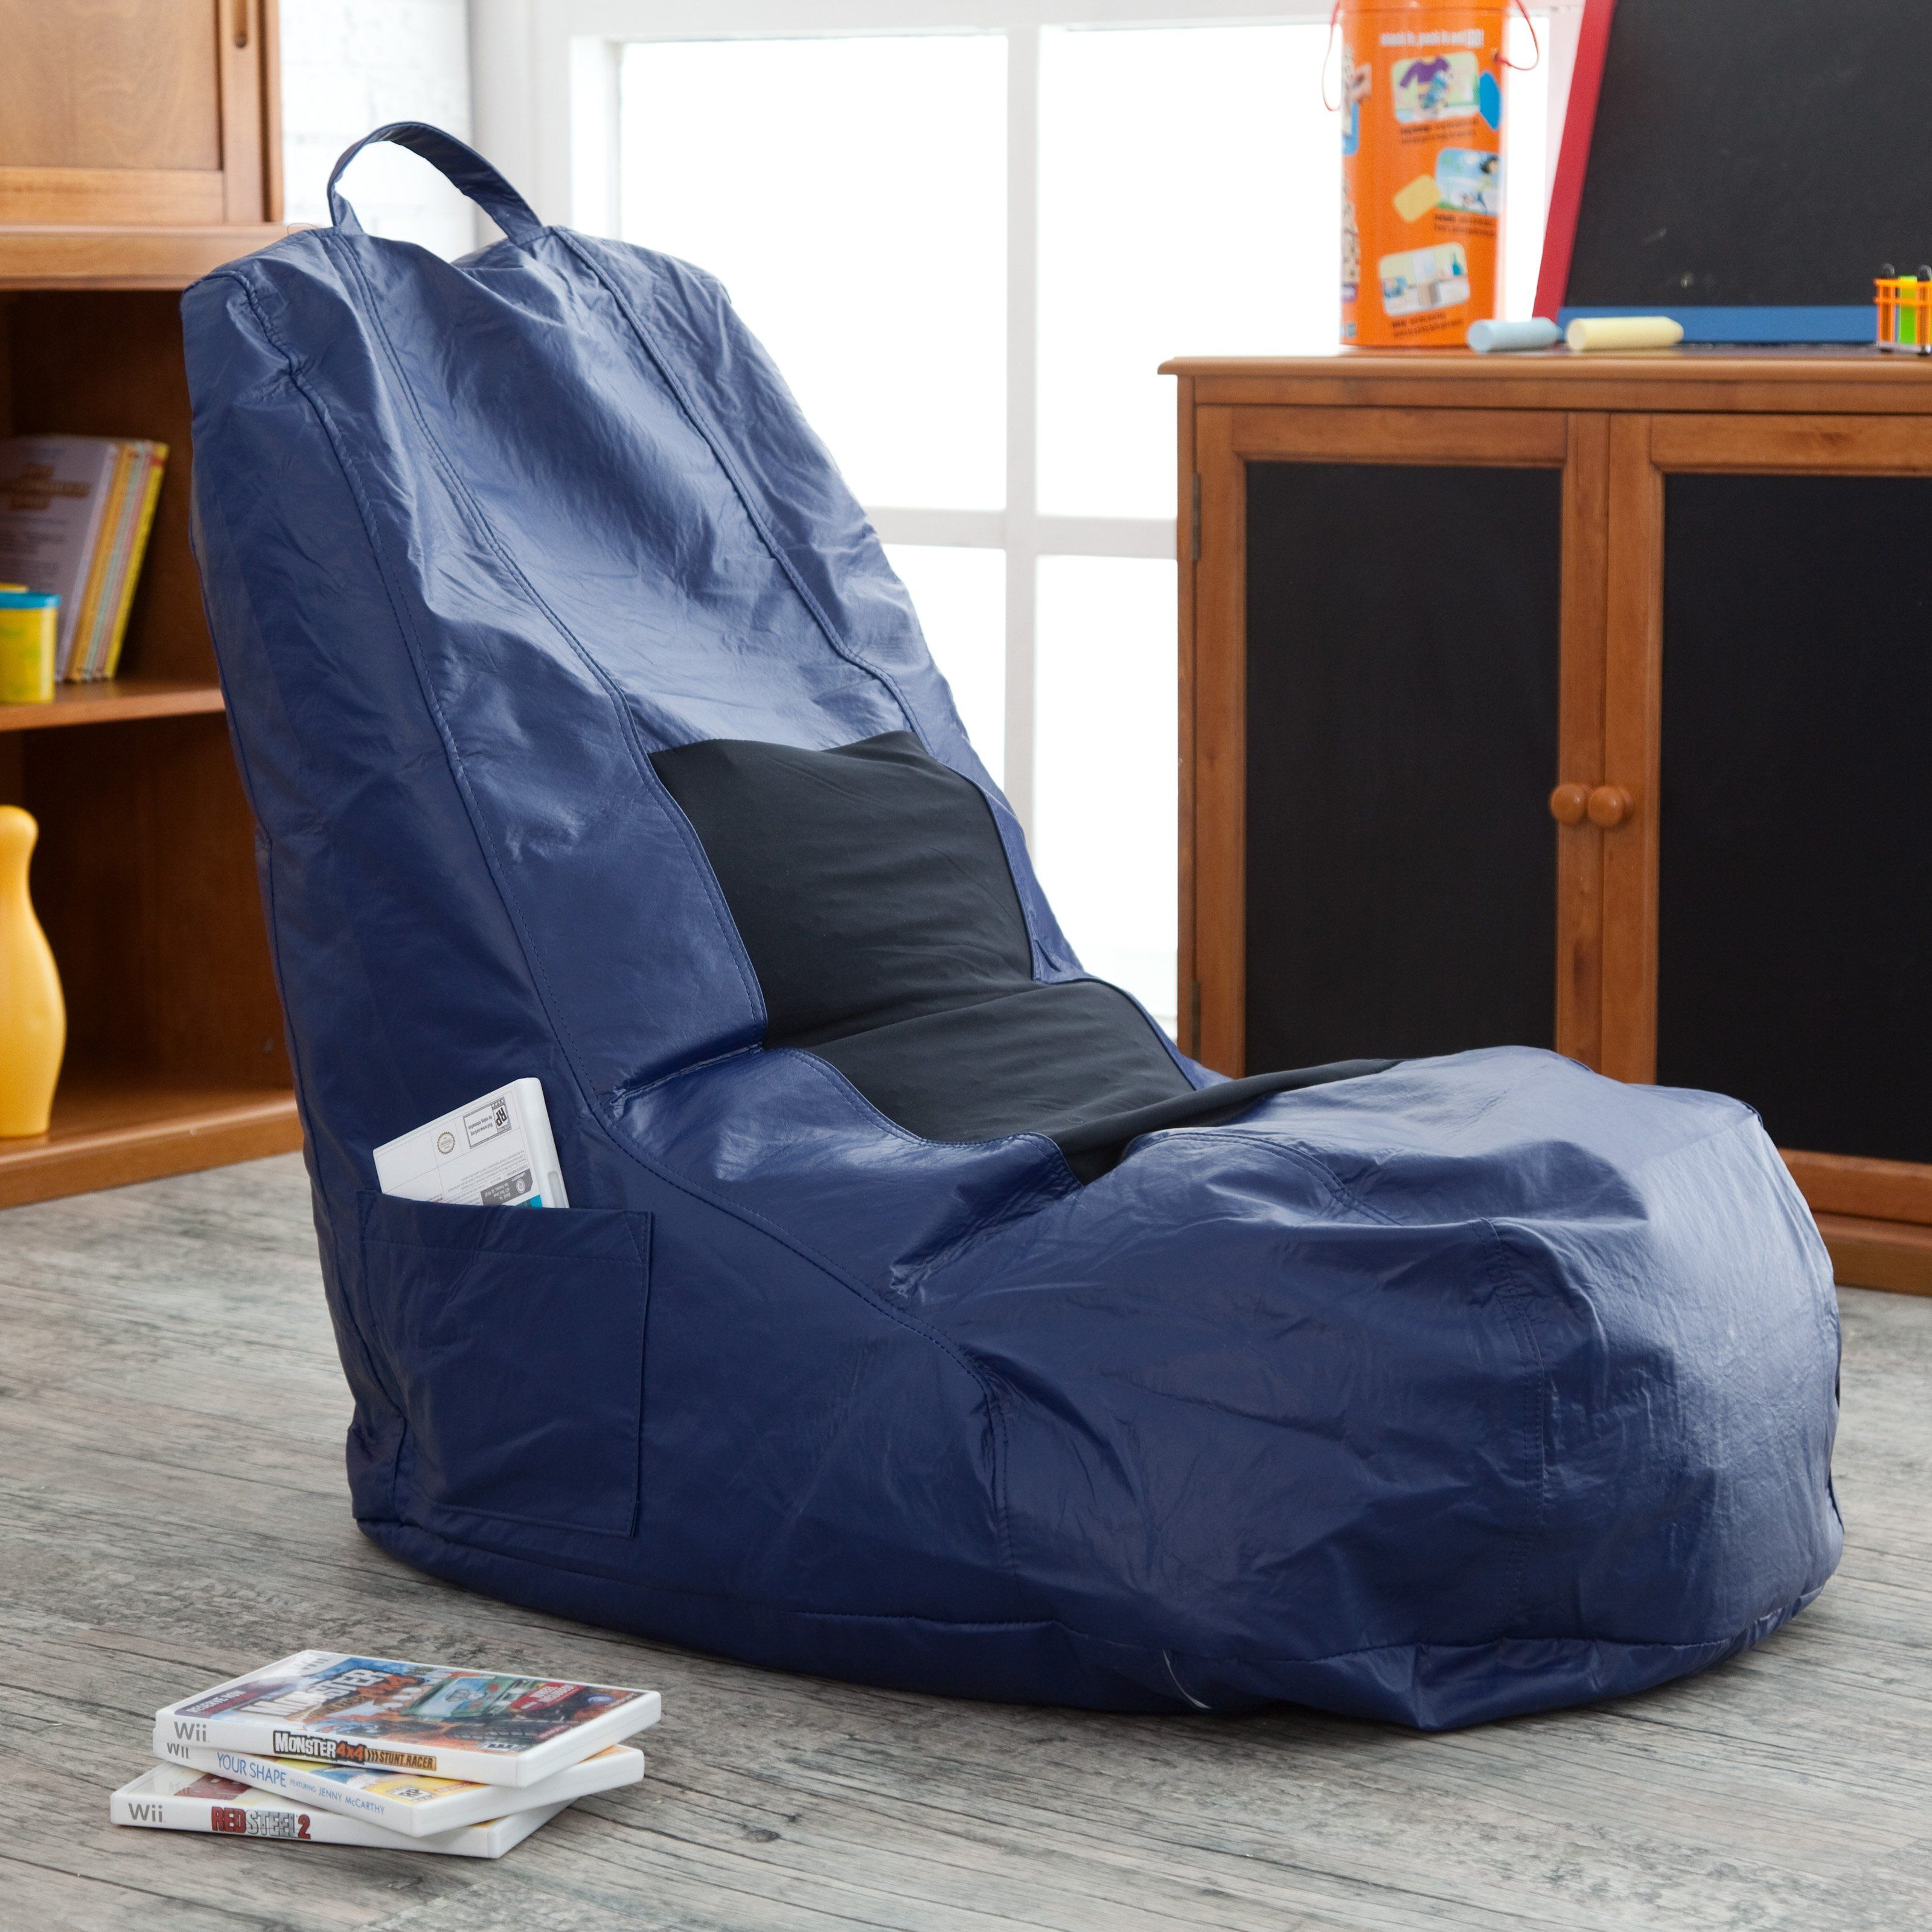 Big joe zip modular armless chair at brookstone buy now - Sweet Spot Vinyl Video Bean Bag Chair From Hayneedle Com